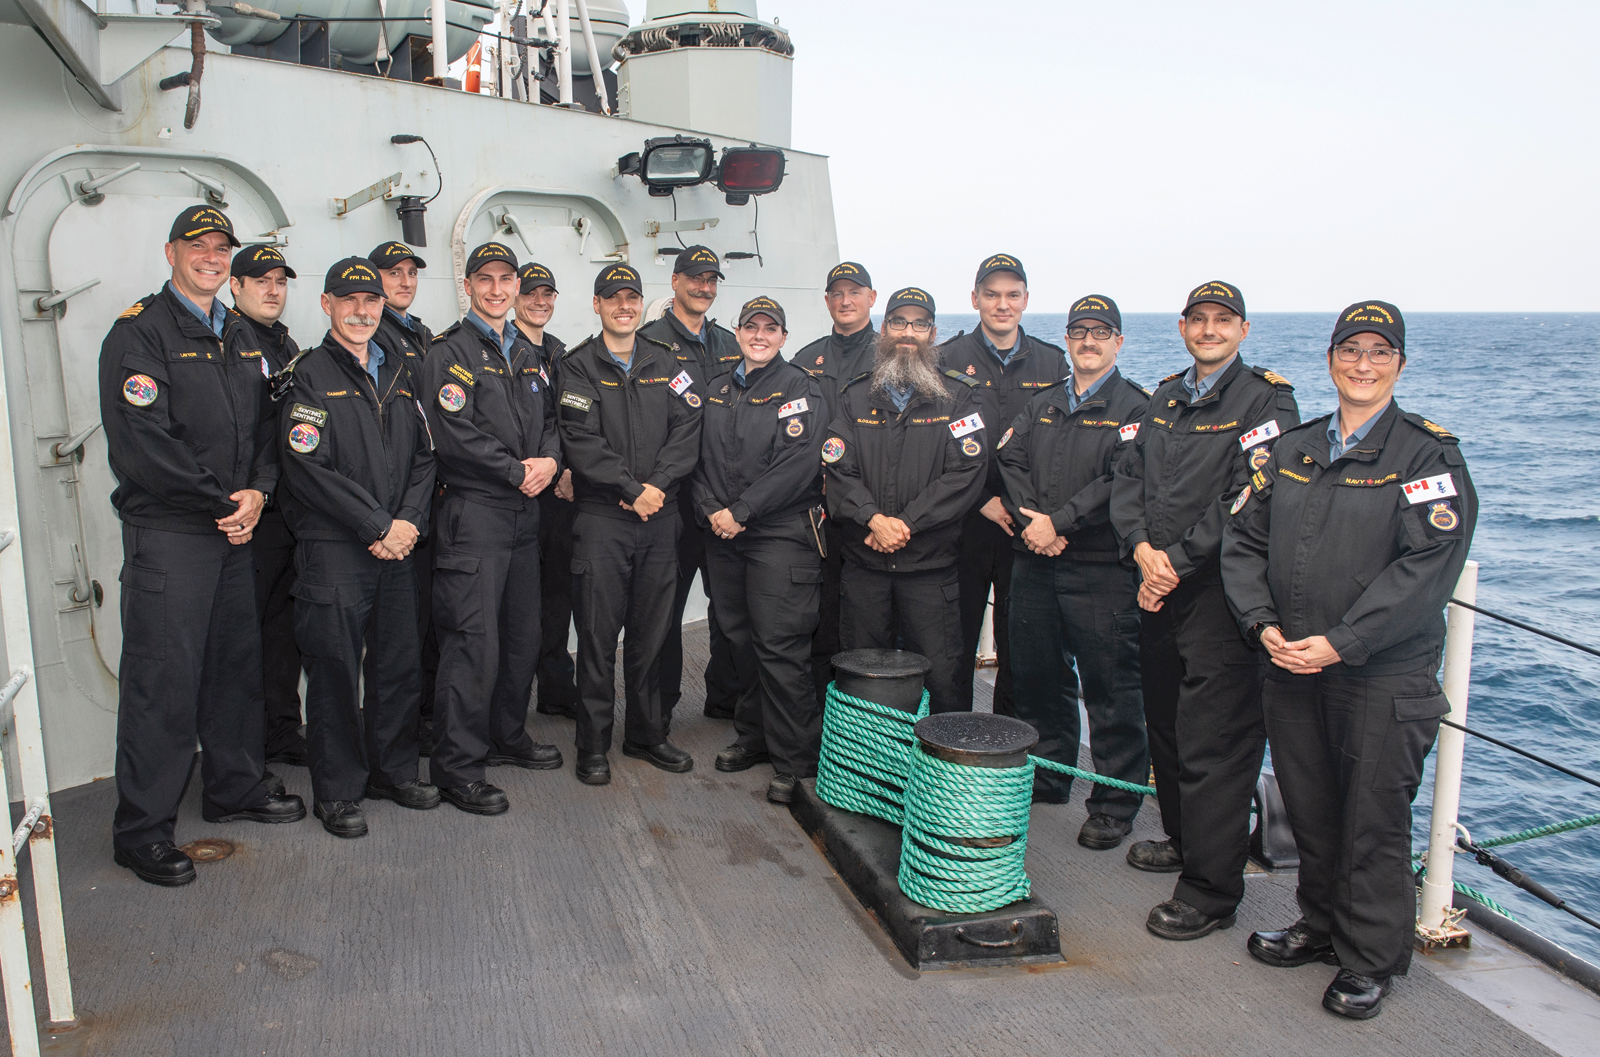 Sentinels aboard HMCS Winnipeg that received refresher training.